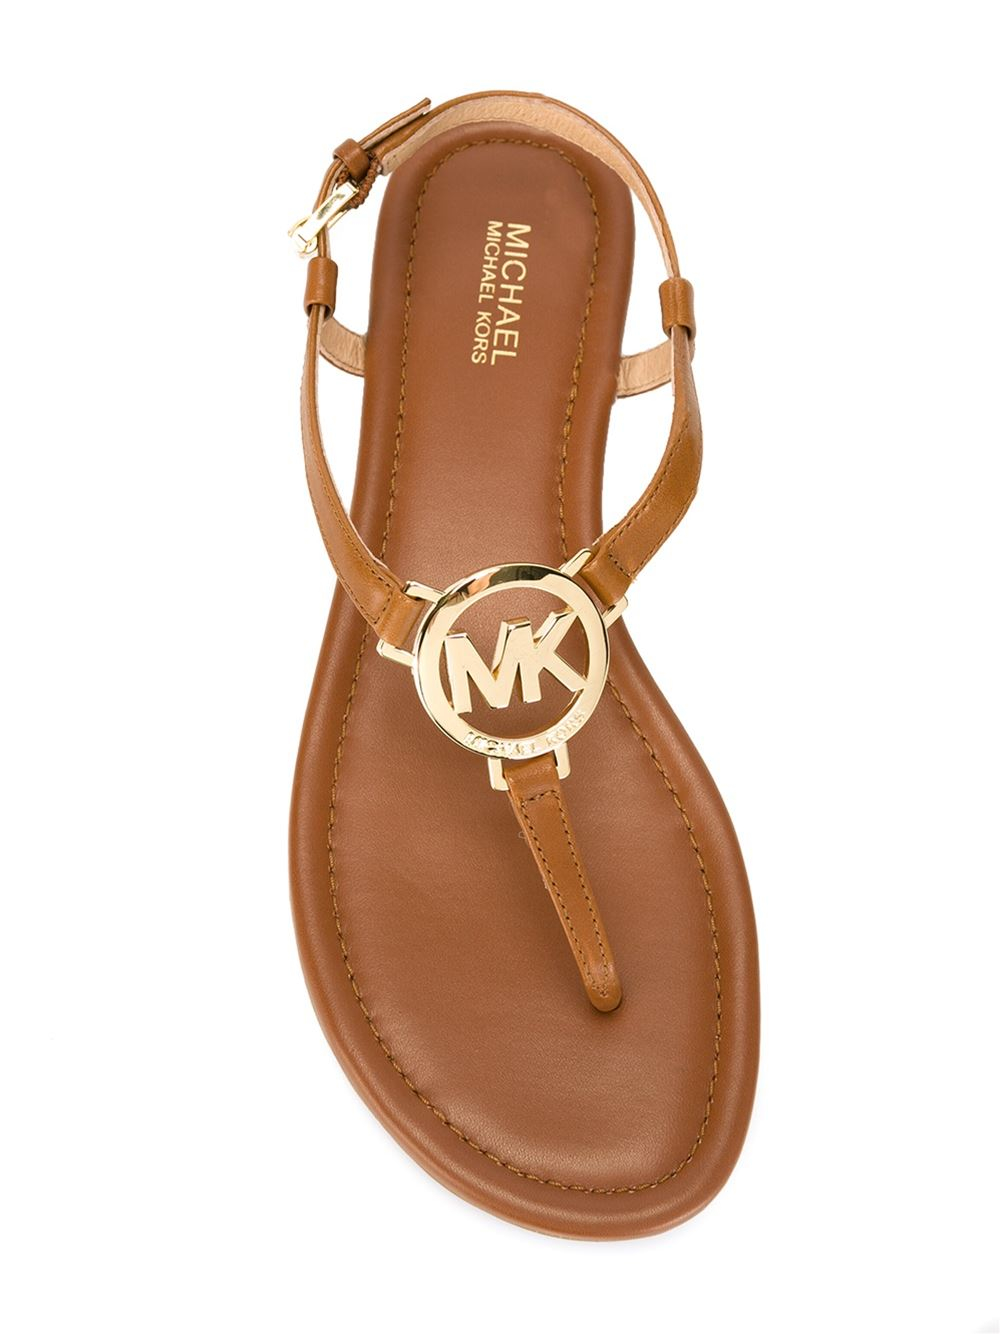 Brown Snakeskin Flat Shoes